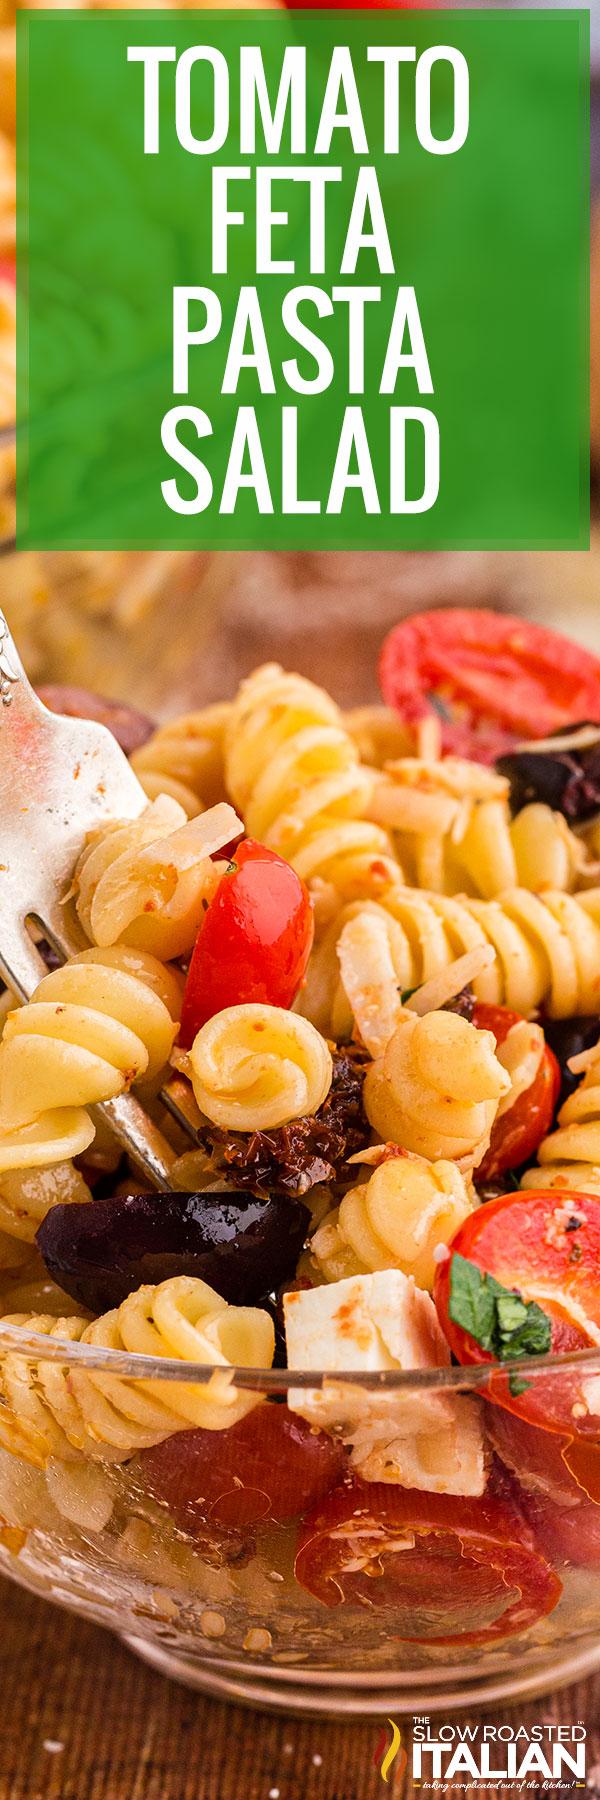 Tomato Feta Pasta Salad closeup